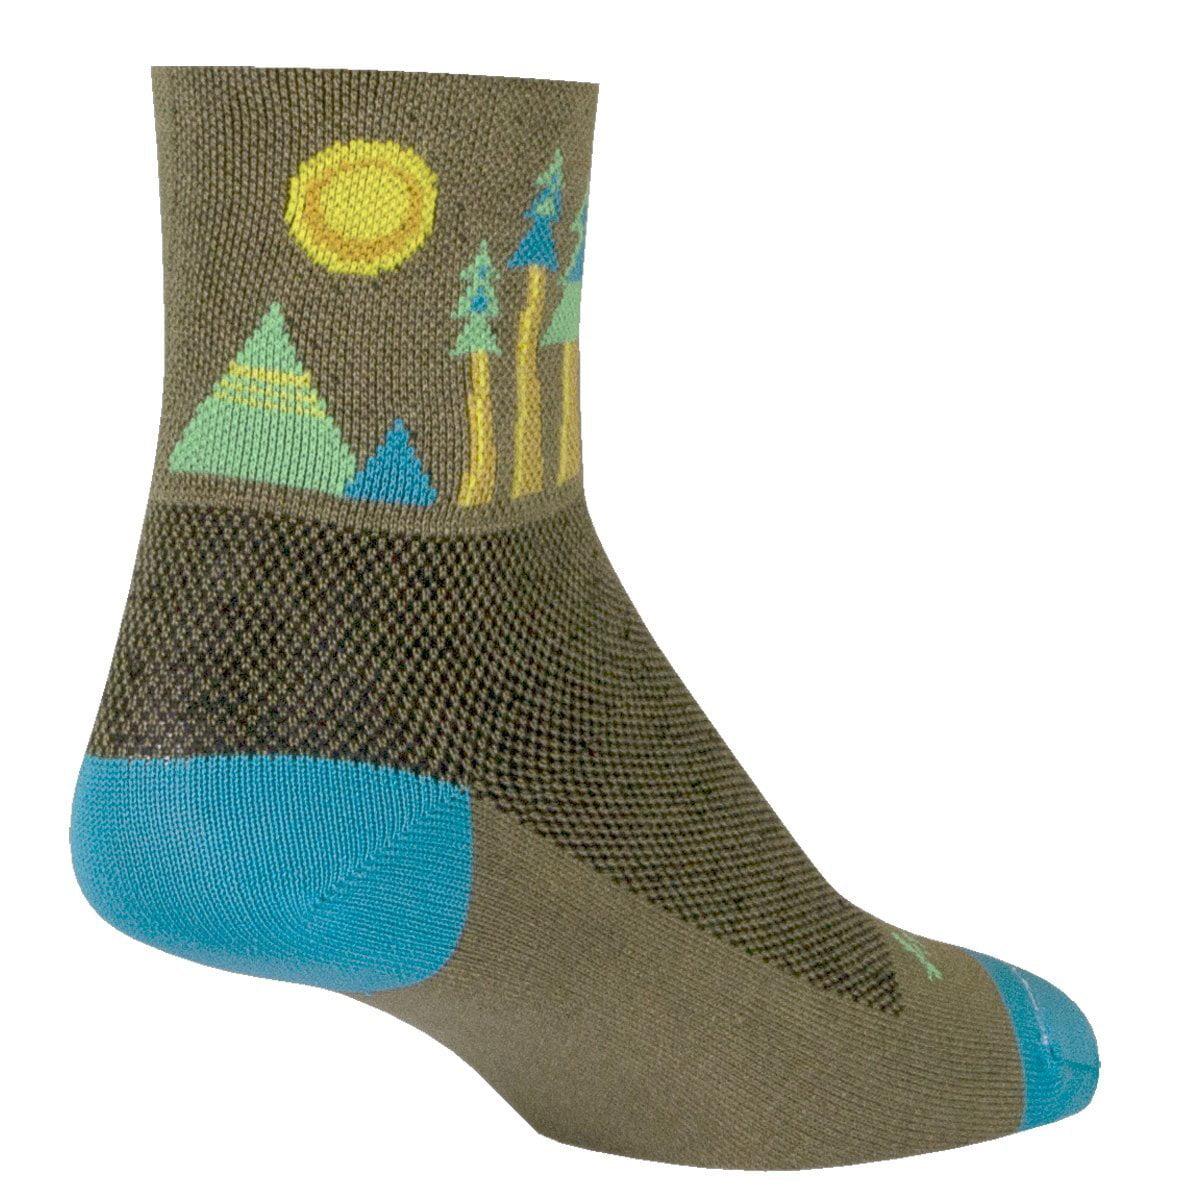 "Socks - Sockguy - Classic 3"" - Sierra L/XL Cycling/Running"